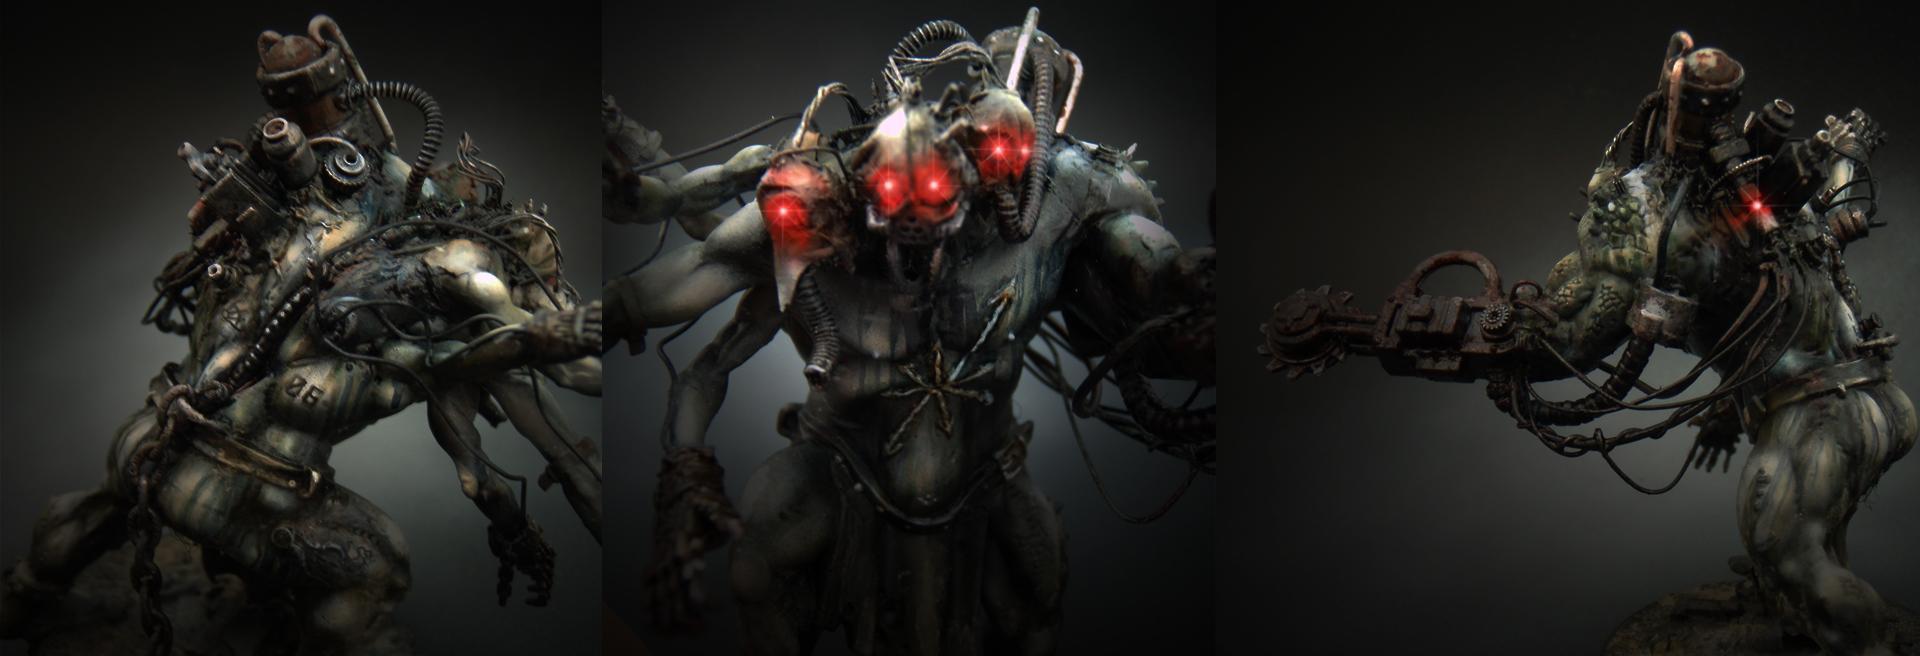 Chaos, Conversion, Mutant, Tweaked